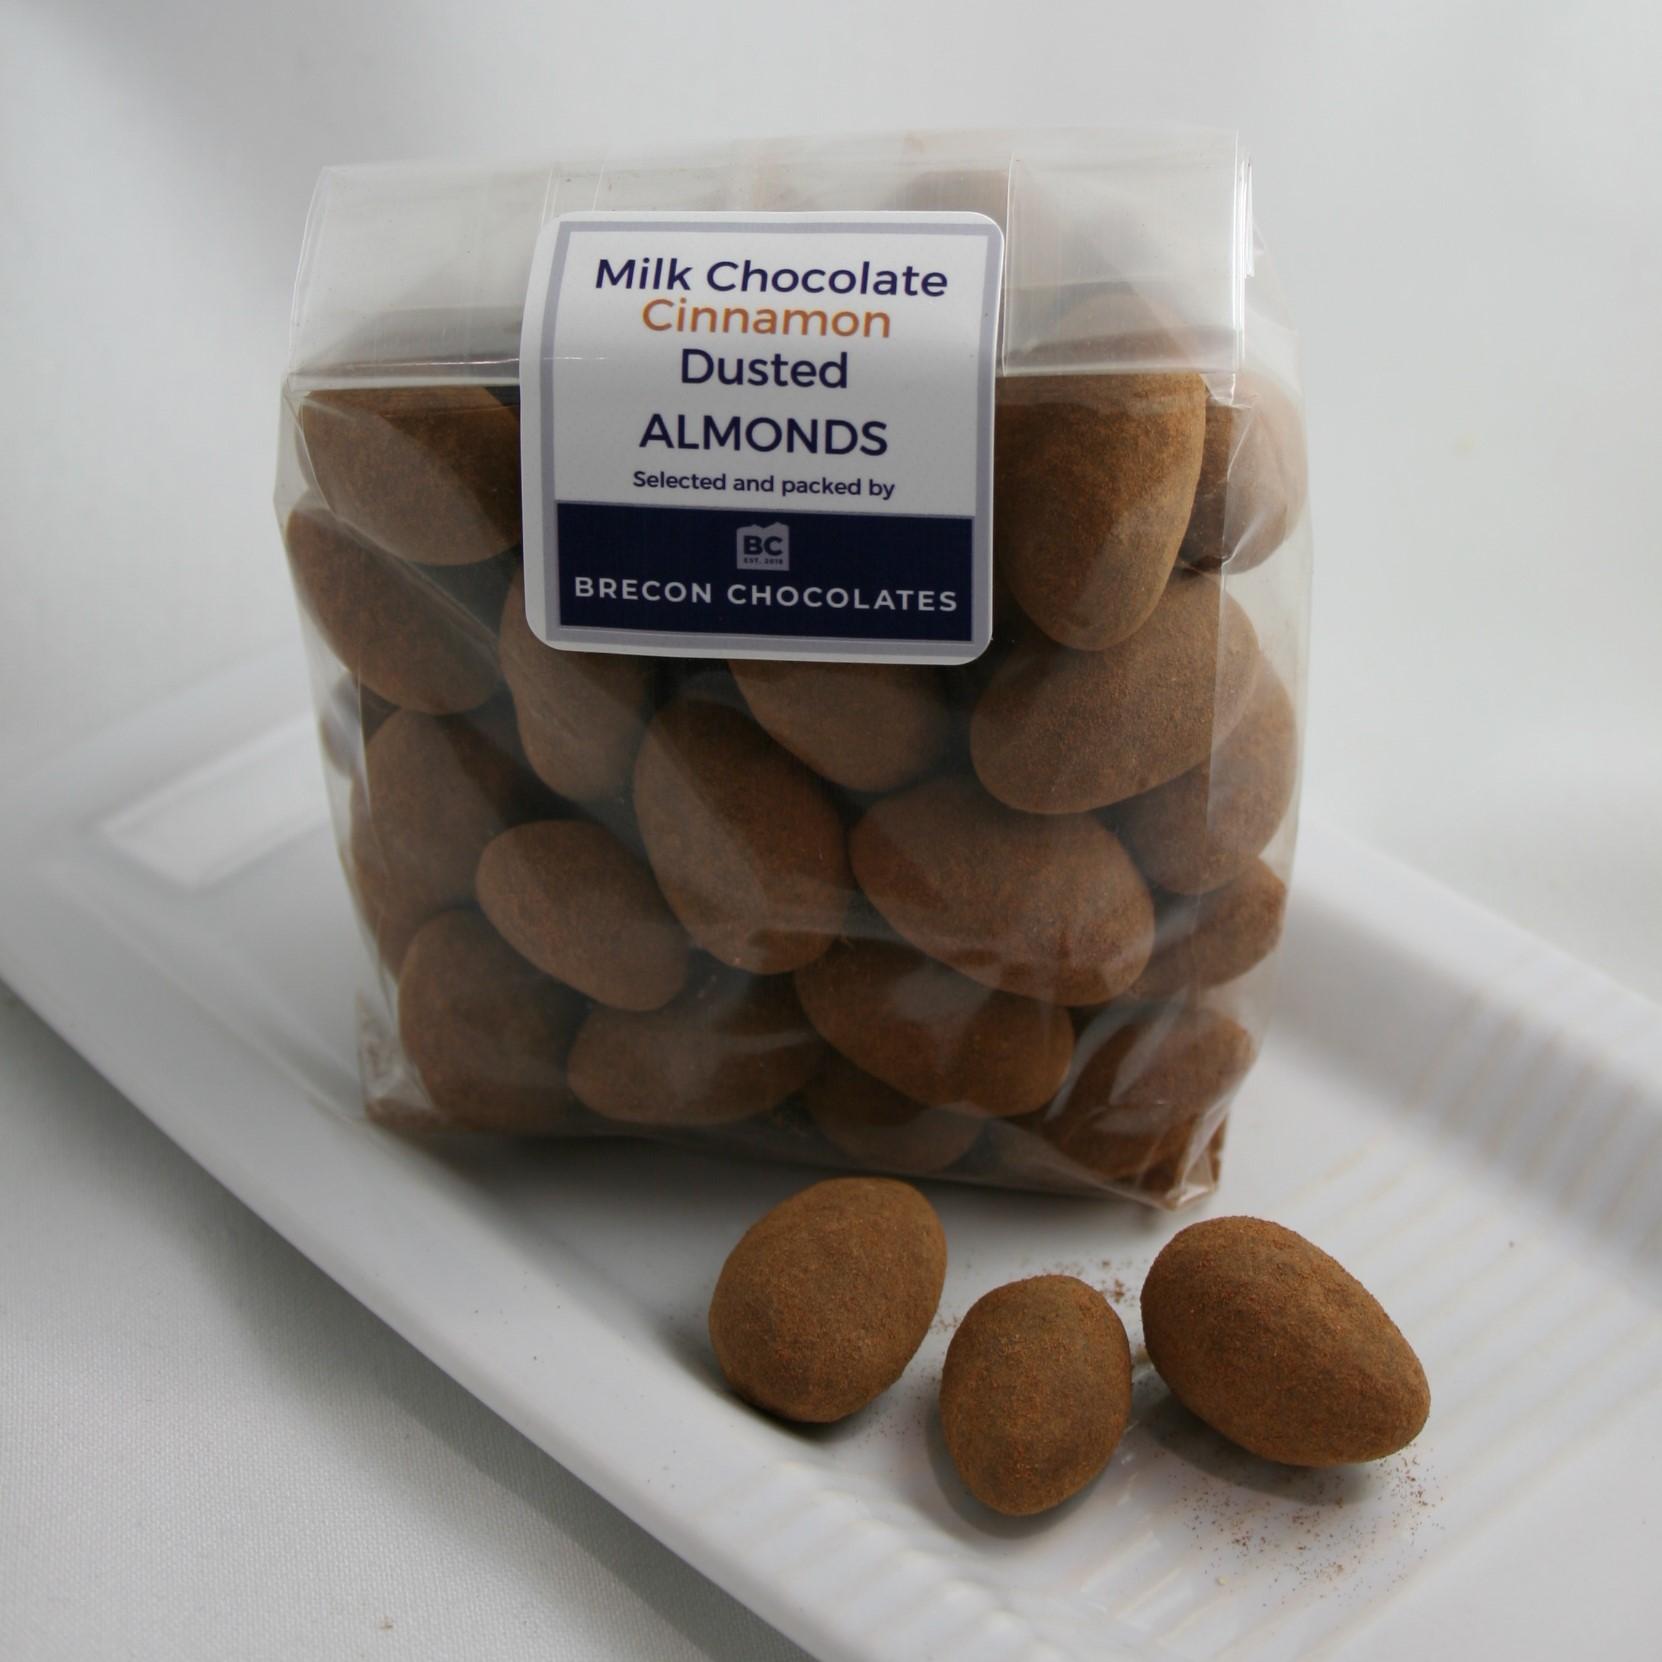 Cinnamon Dusted Milk Chocolate Almonds